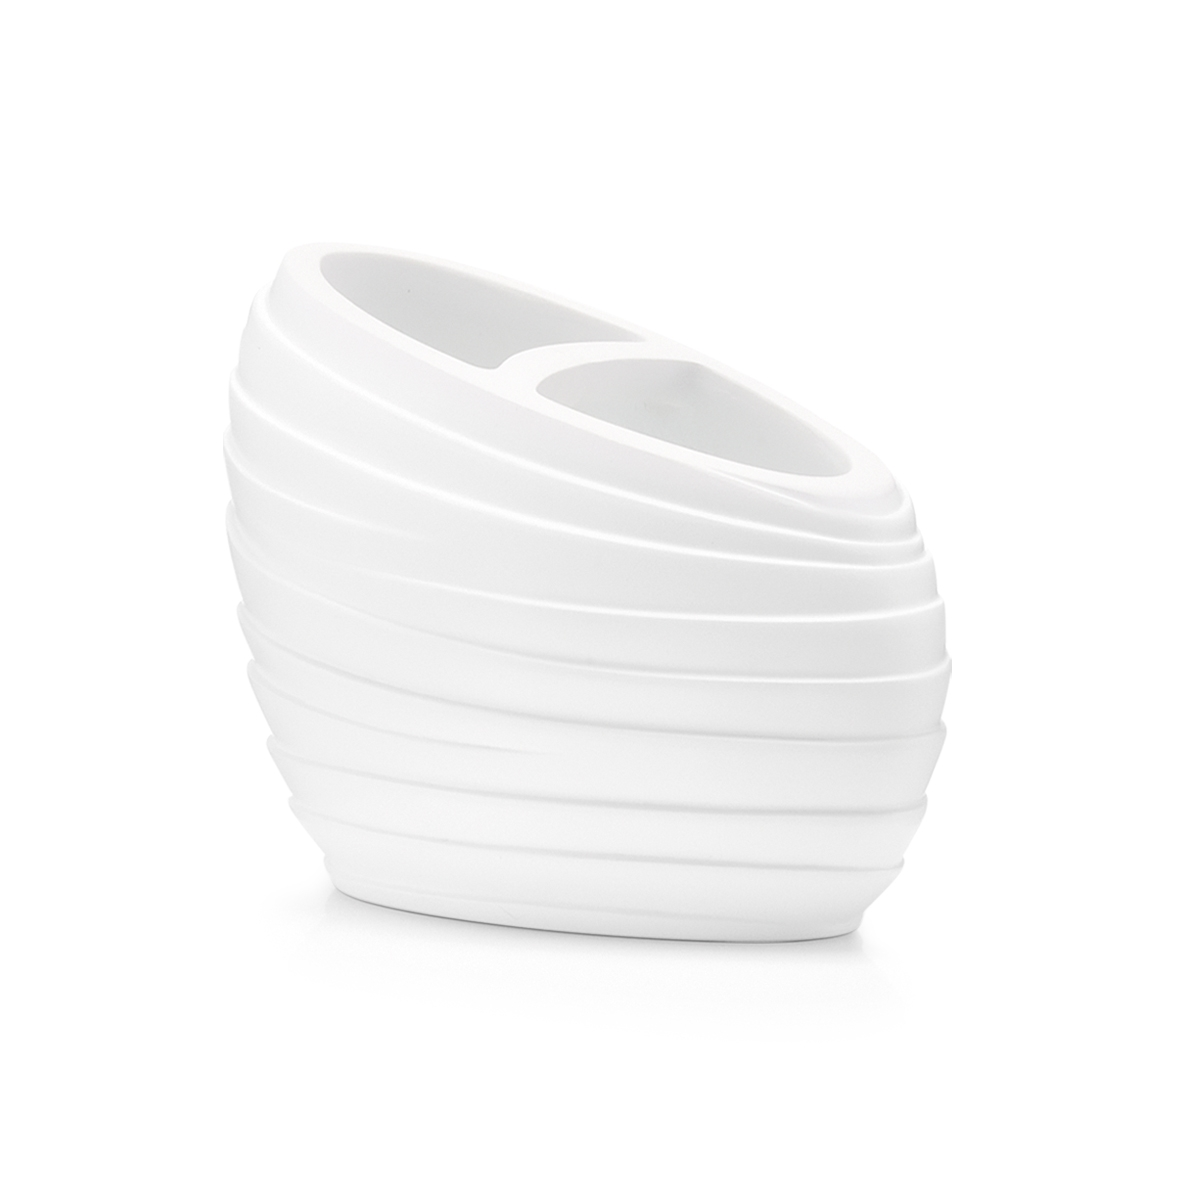 Suport pentru periuta din polirasina, Abstrakt White, l12,5xA6,5xH8,9 cm